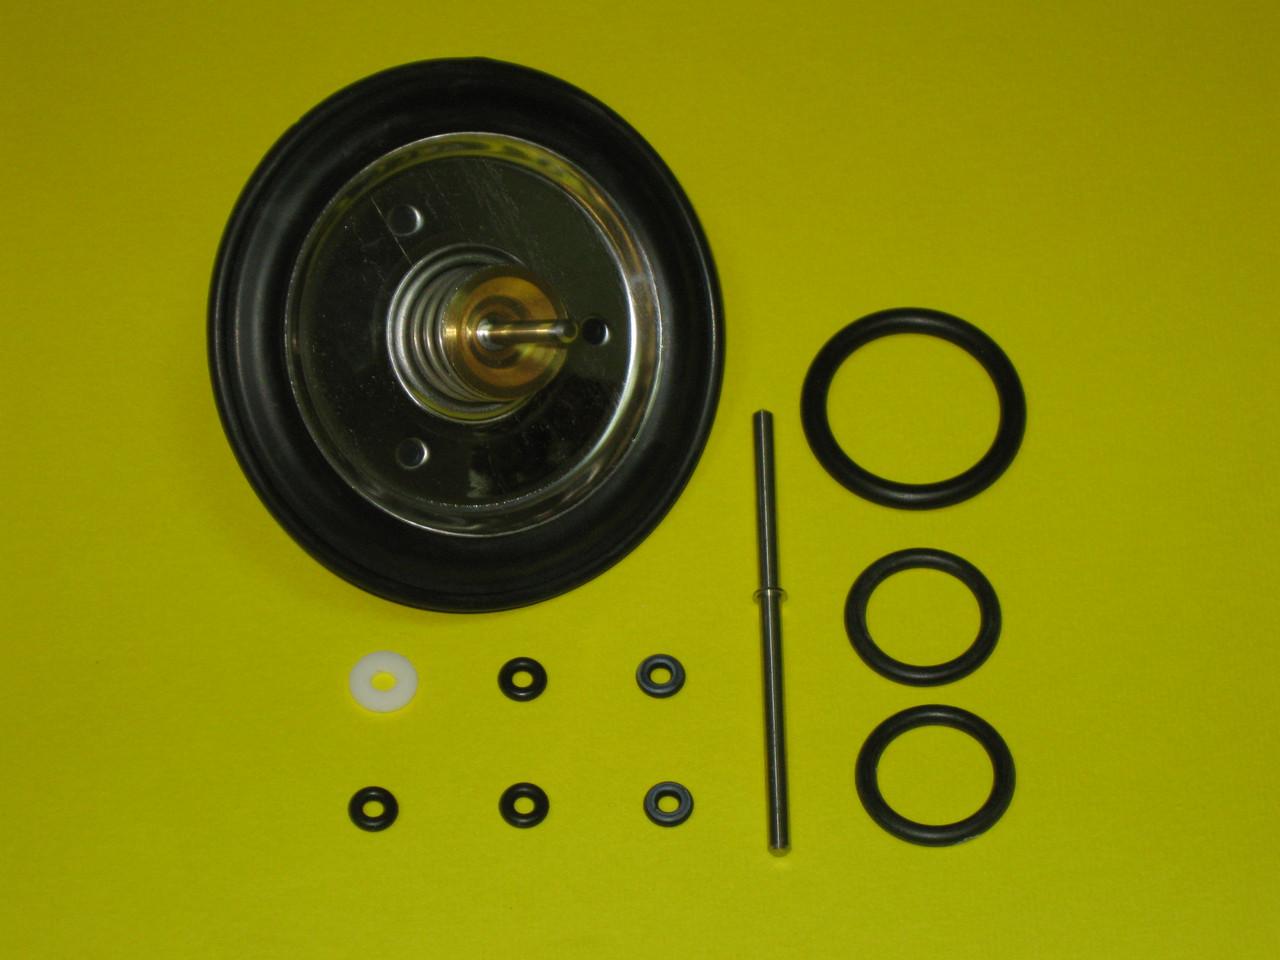 Ремкомплект трехходового клапана H403000013 (403000013) Hermann Thesi